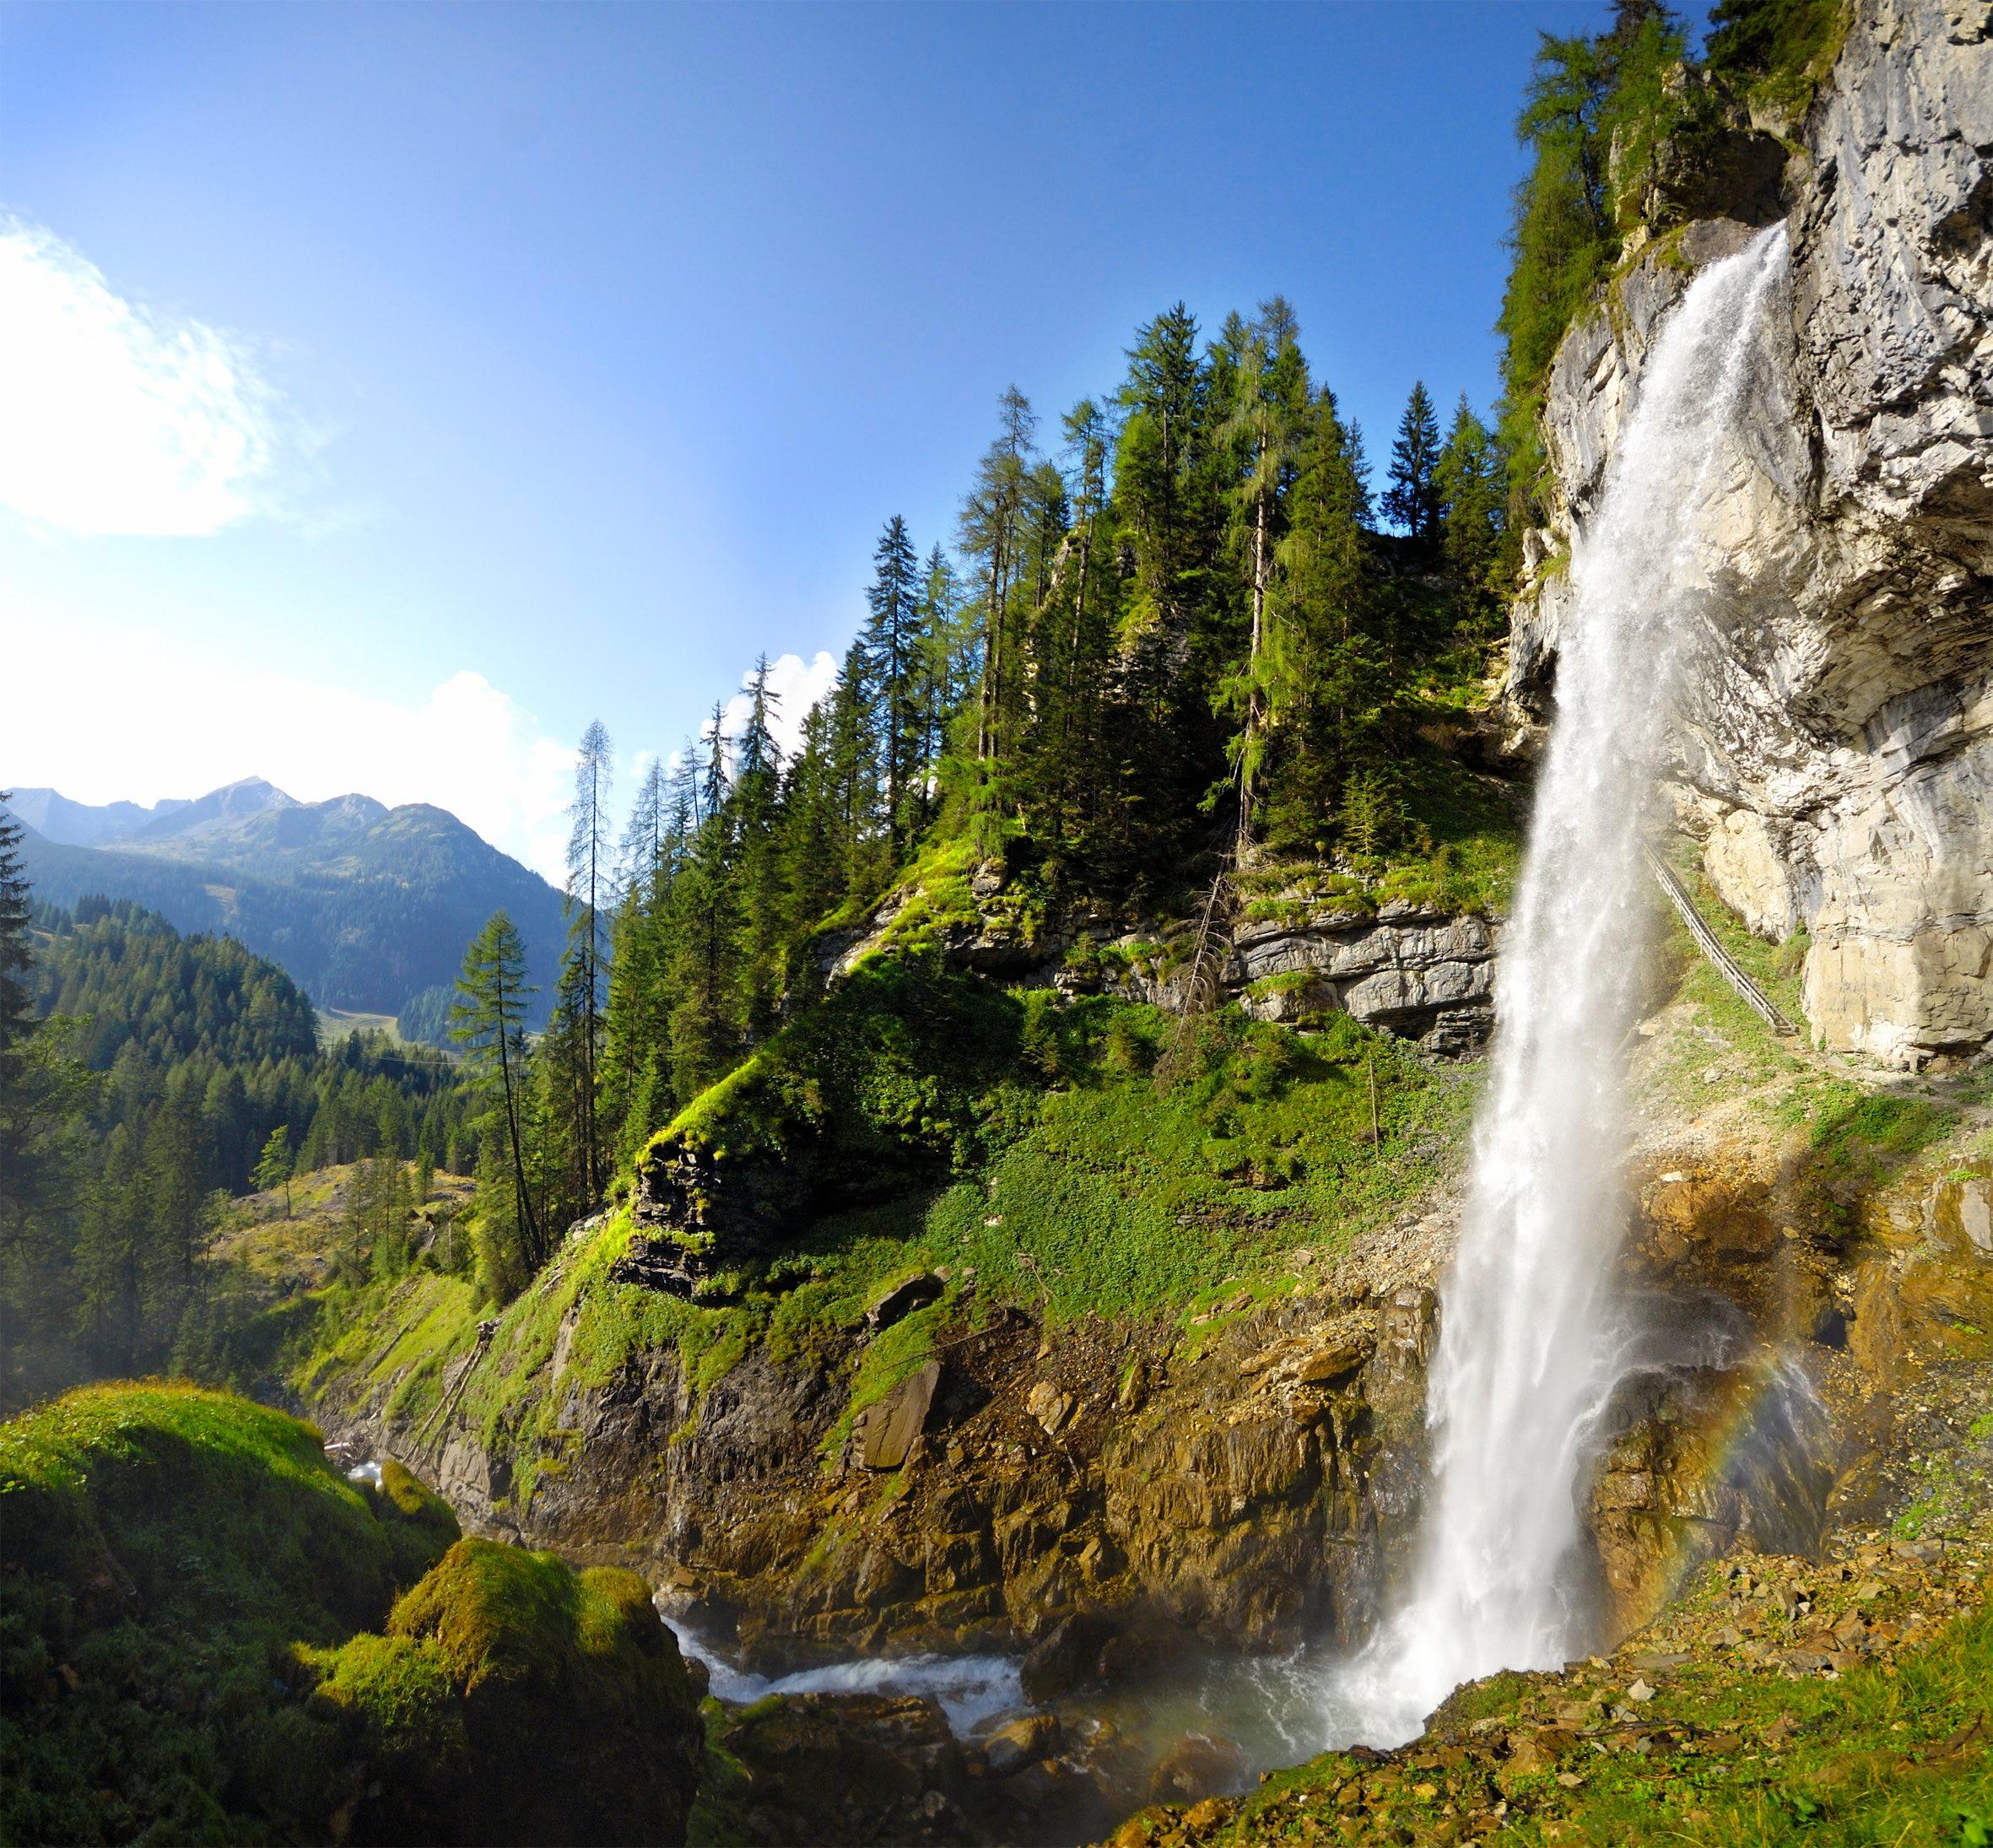 Wandern: Johanneswasserfall in Obertauern - Bergwelten